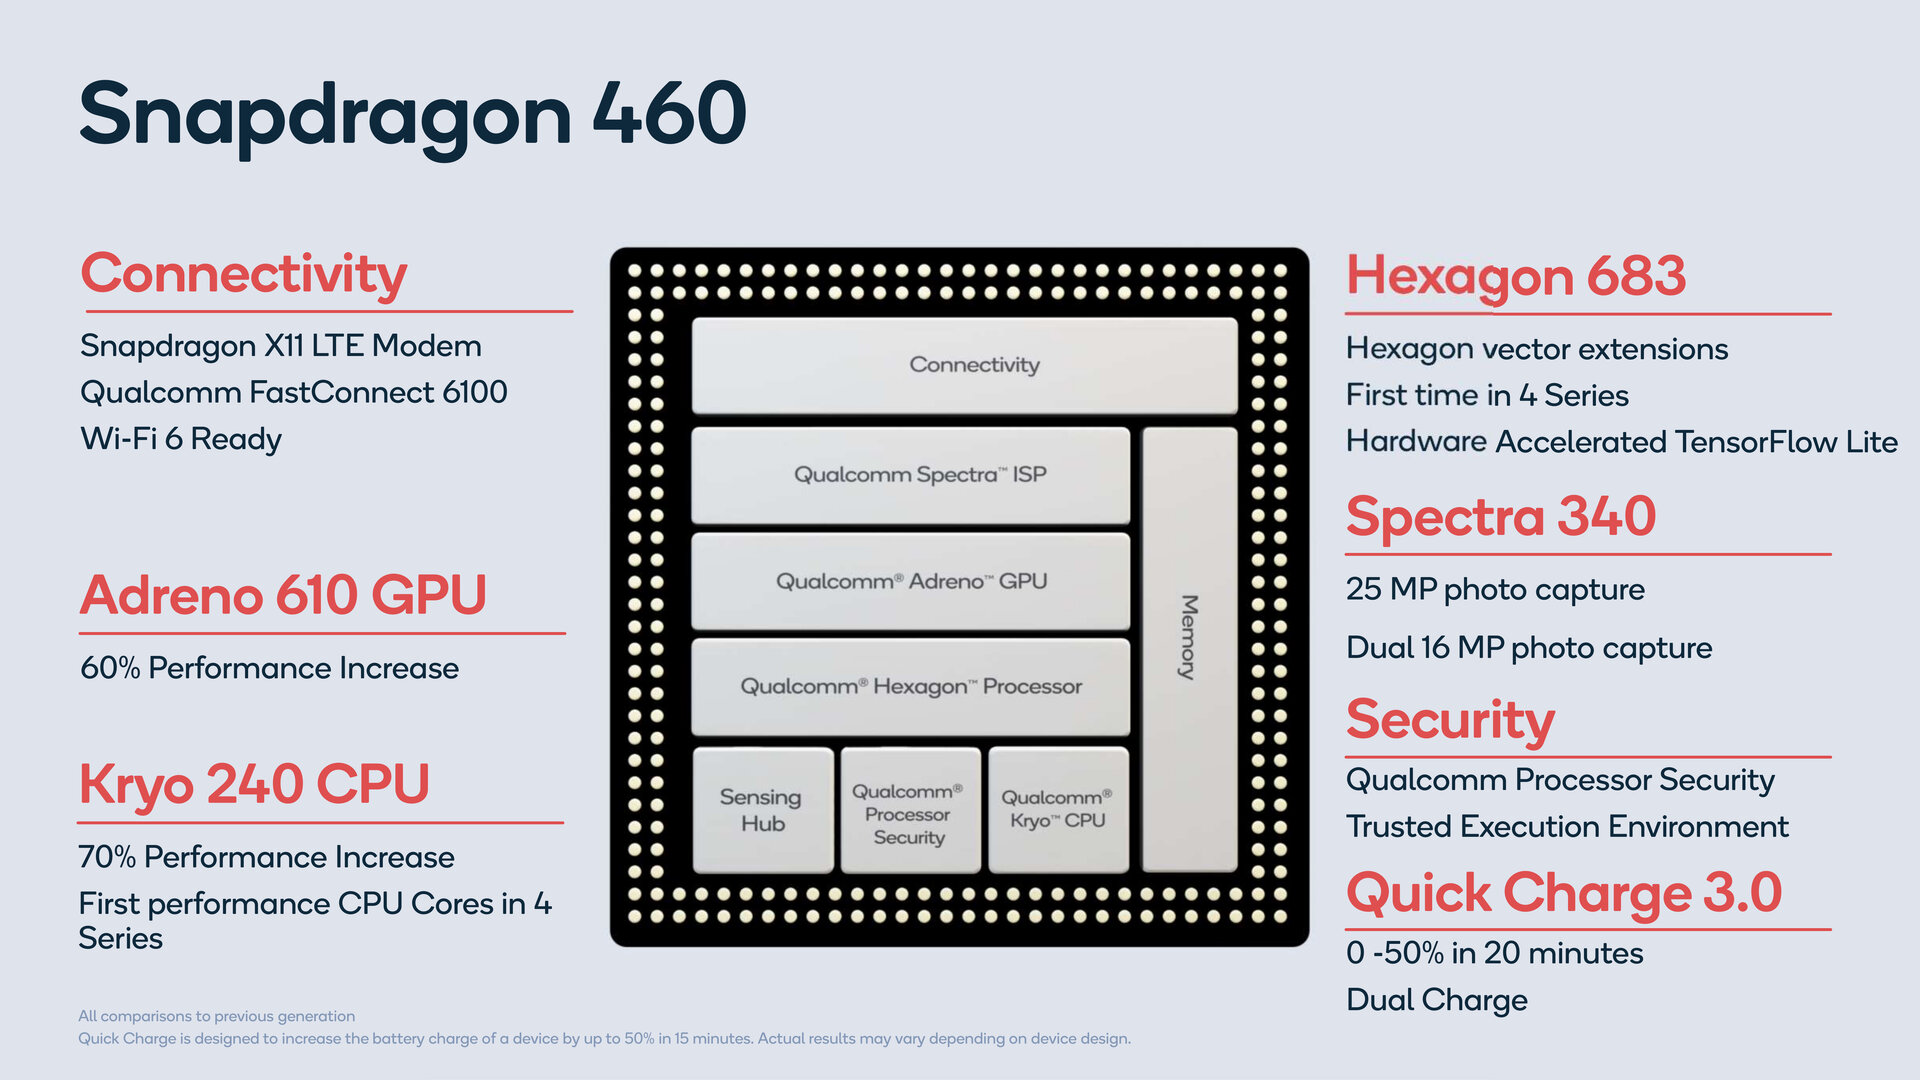 Snapdragon 460